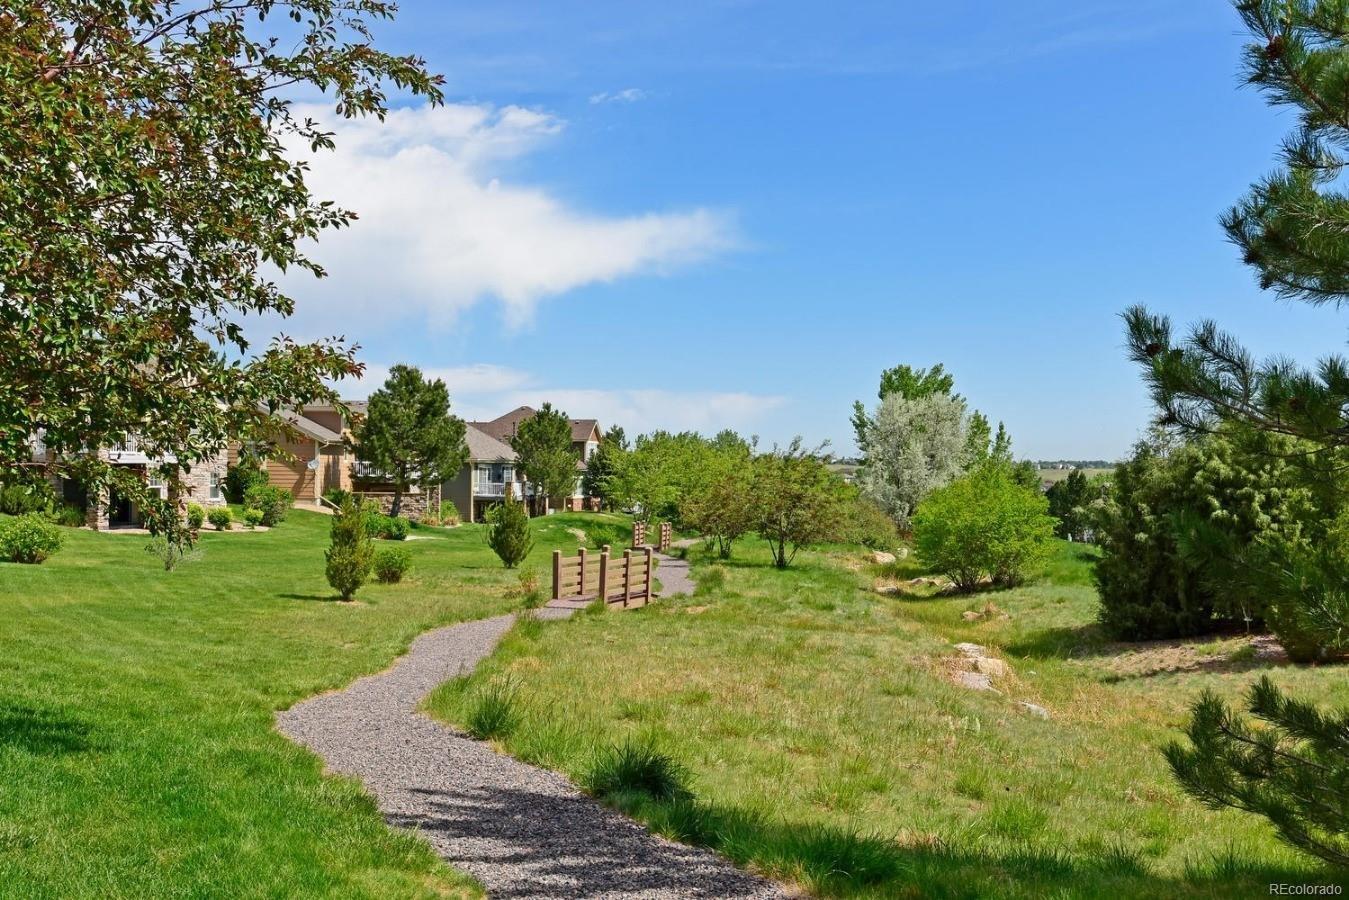 Very quiet community for peacefull walks